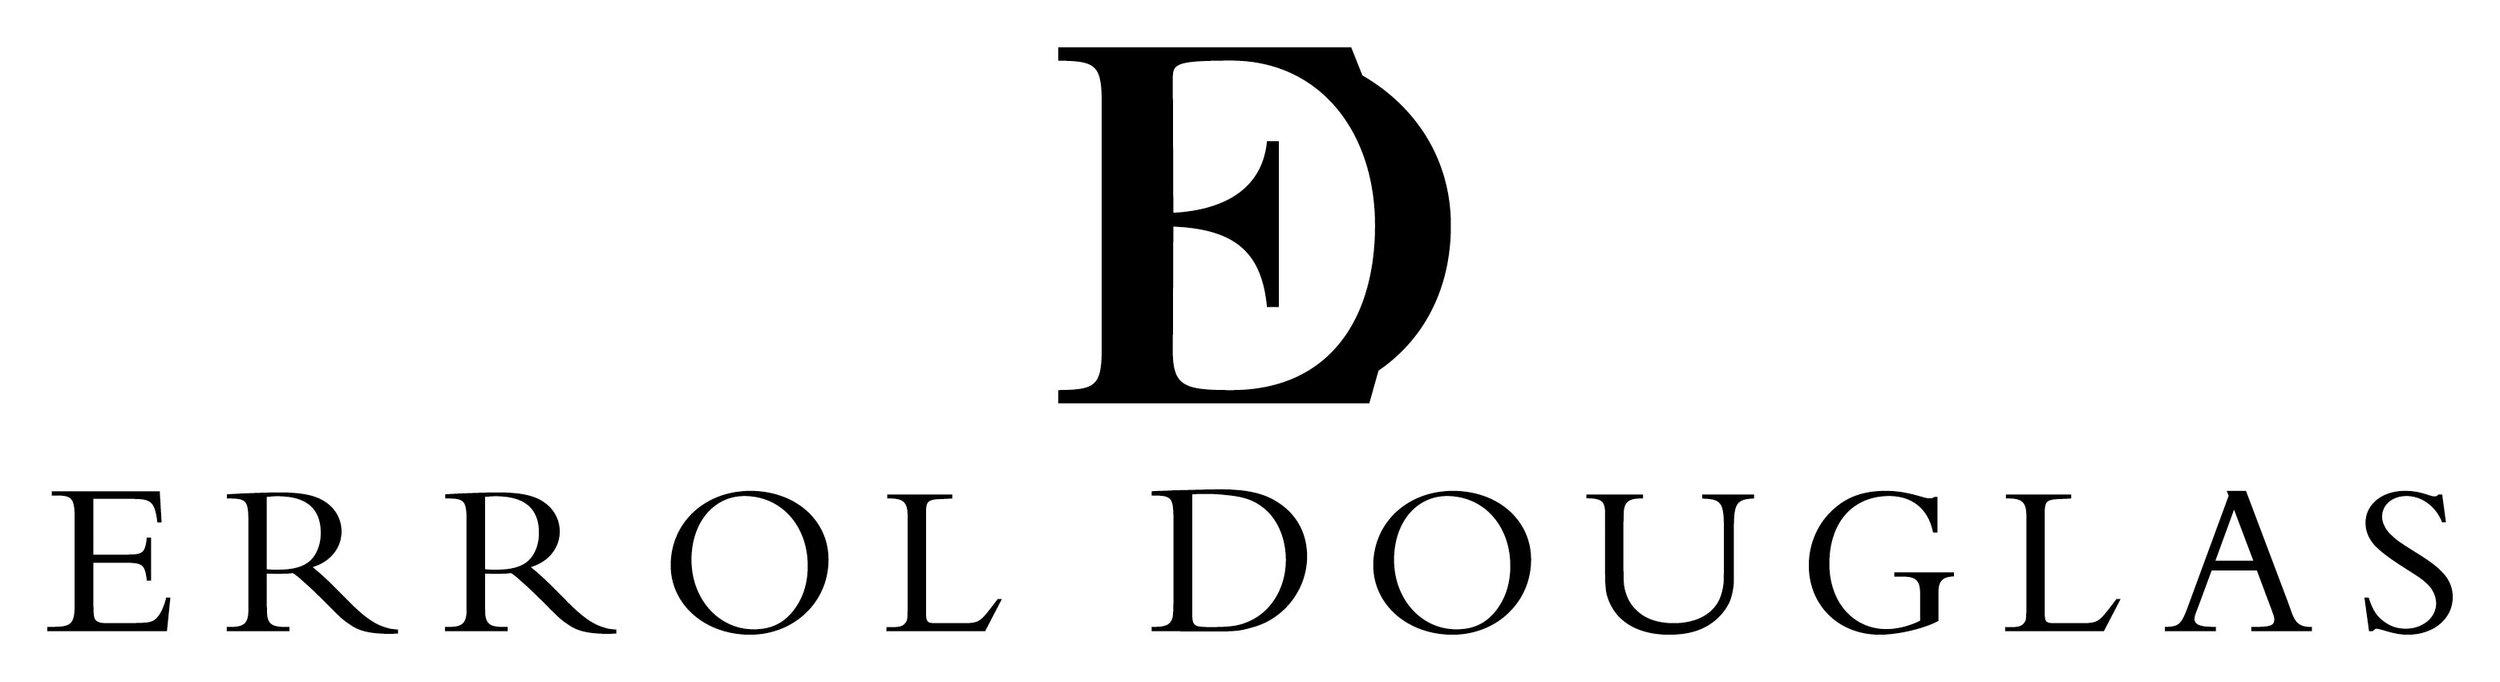 ED_ERROL DOUGLAS_Logo.jpeg